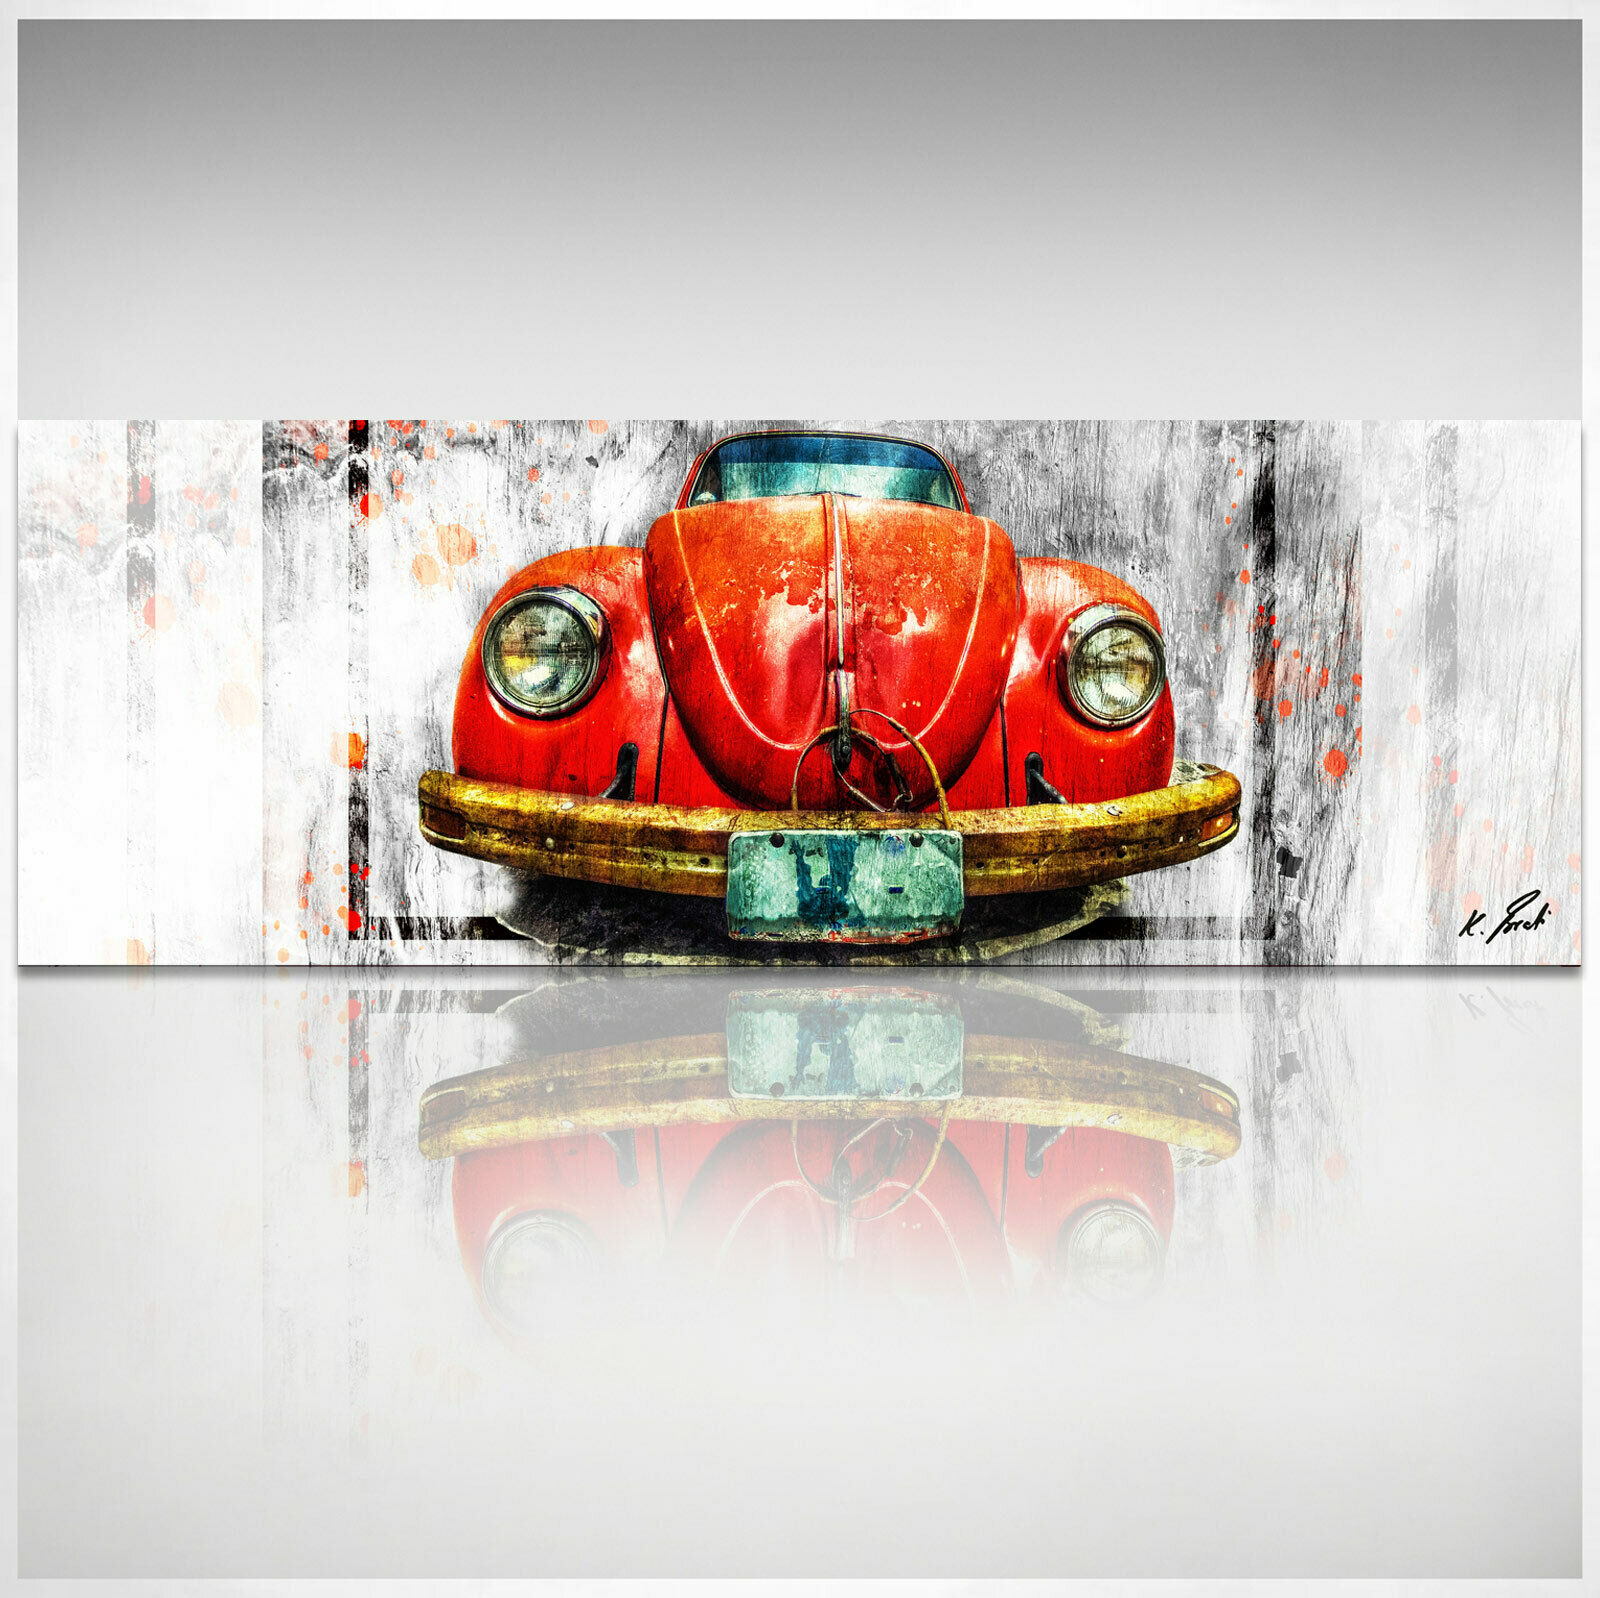 Panorama Bild Auto VW Käfer Oldtimer Leinwand Abstrakte Bilder Wandbilder D1998